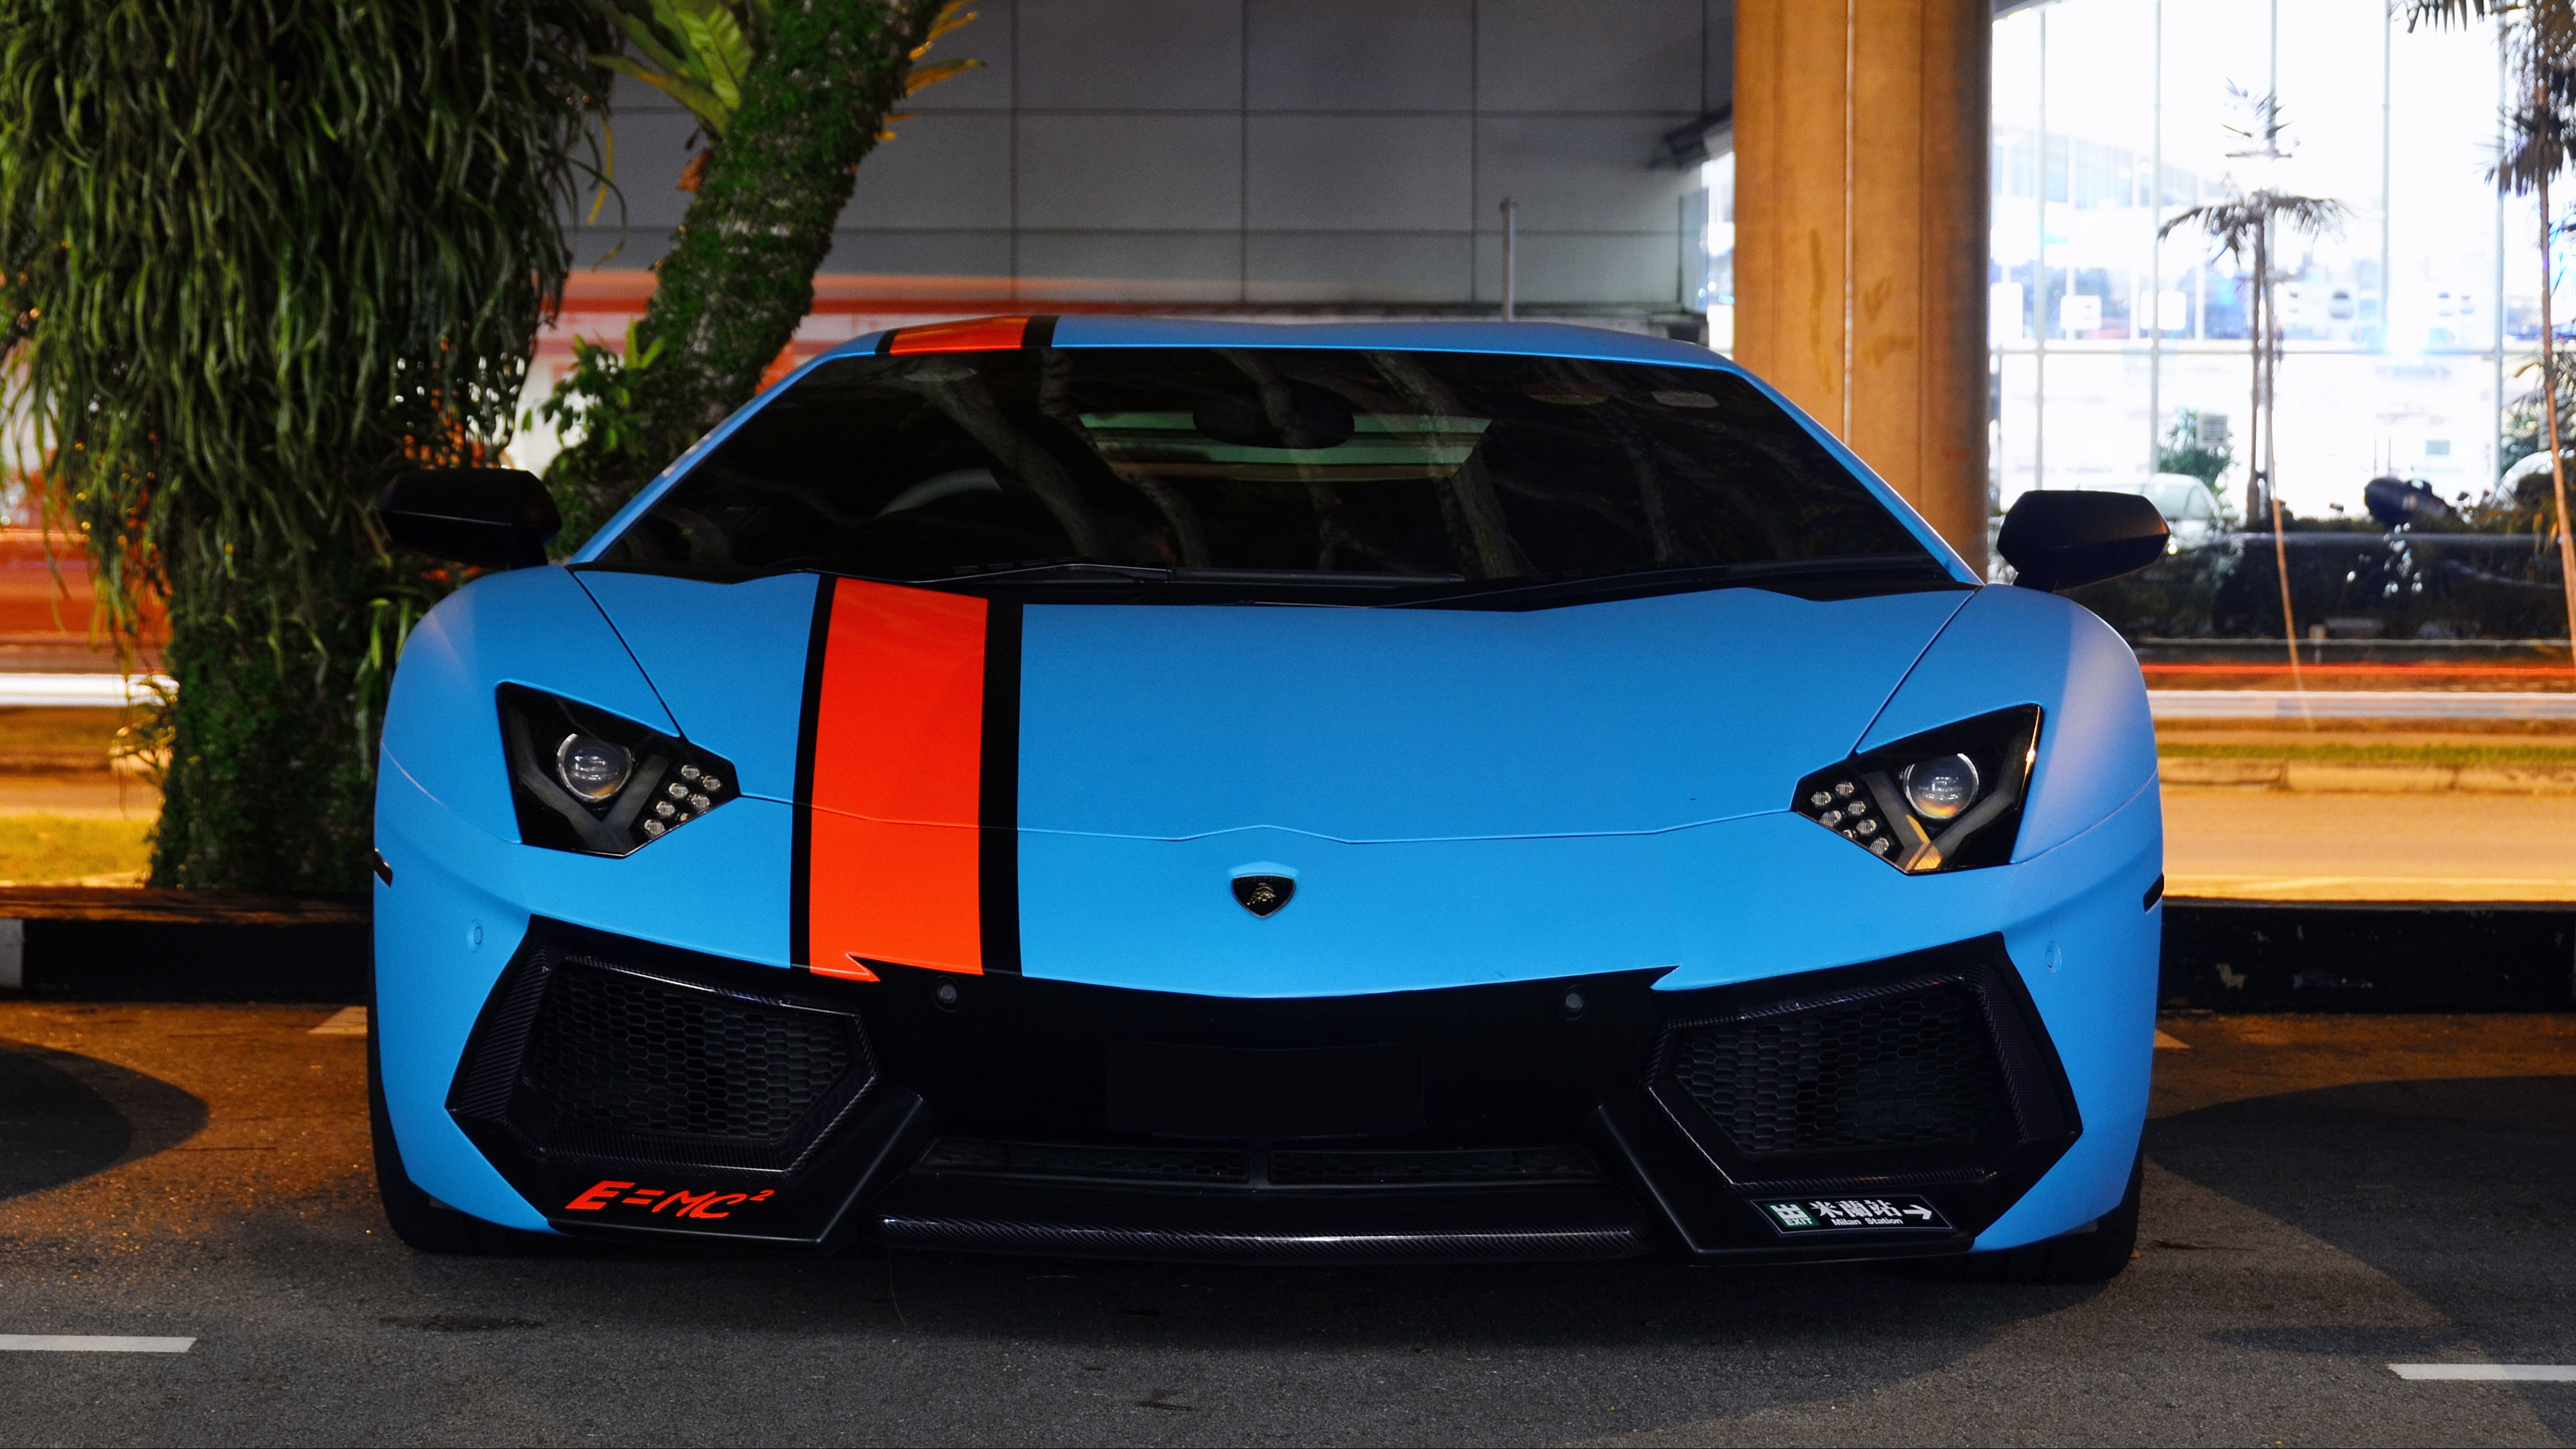 lamborghini aventador lp700 4 blue supercars exotic 4k 1538938596 - lamborghini, aventador, lp700-4, blue, supercars, exotic 4k - lp700-4, Lamborghini, Aventador